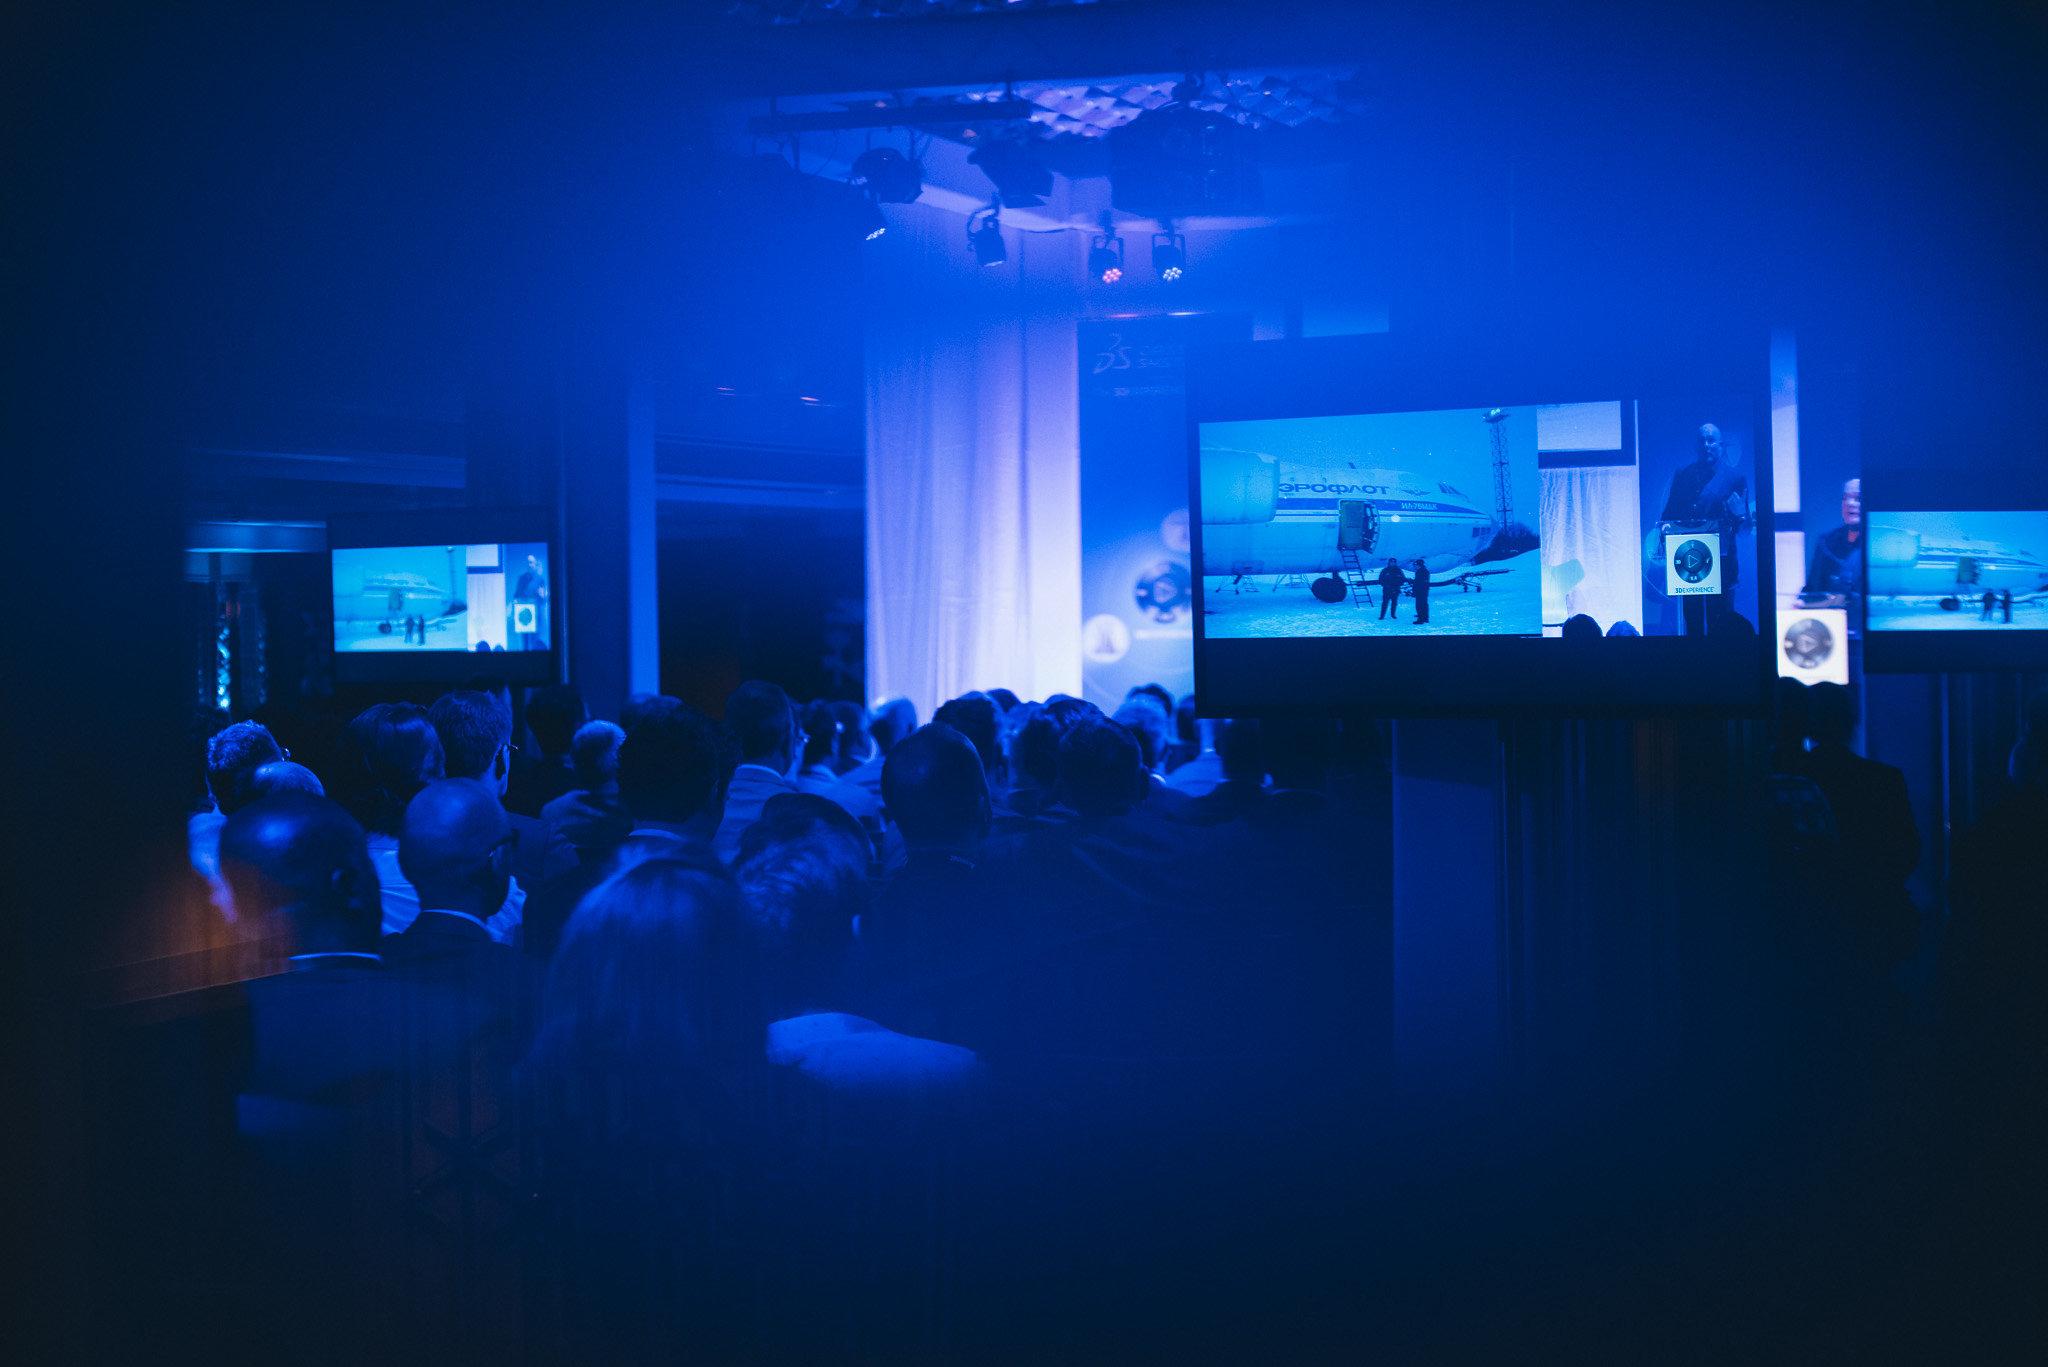 3DX_forum_event_highlights_rotterdam_presentations-93.jpg